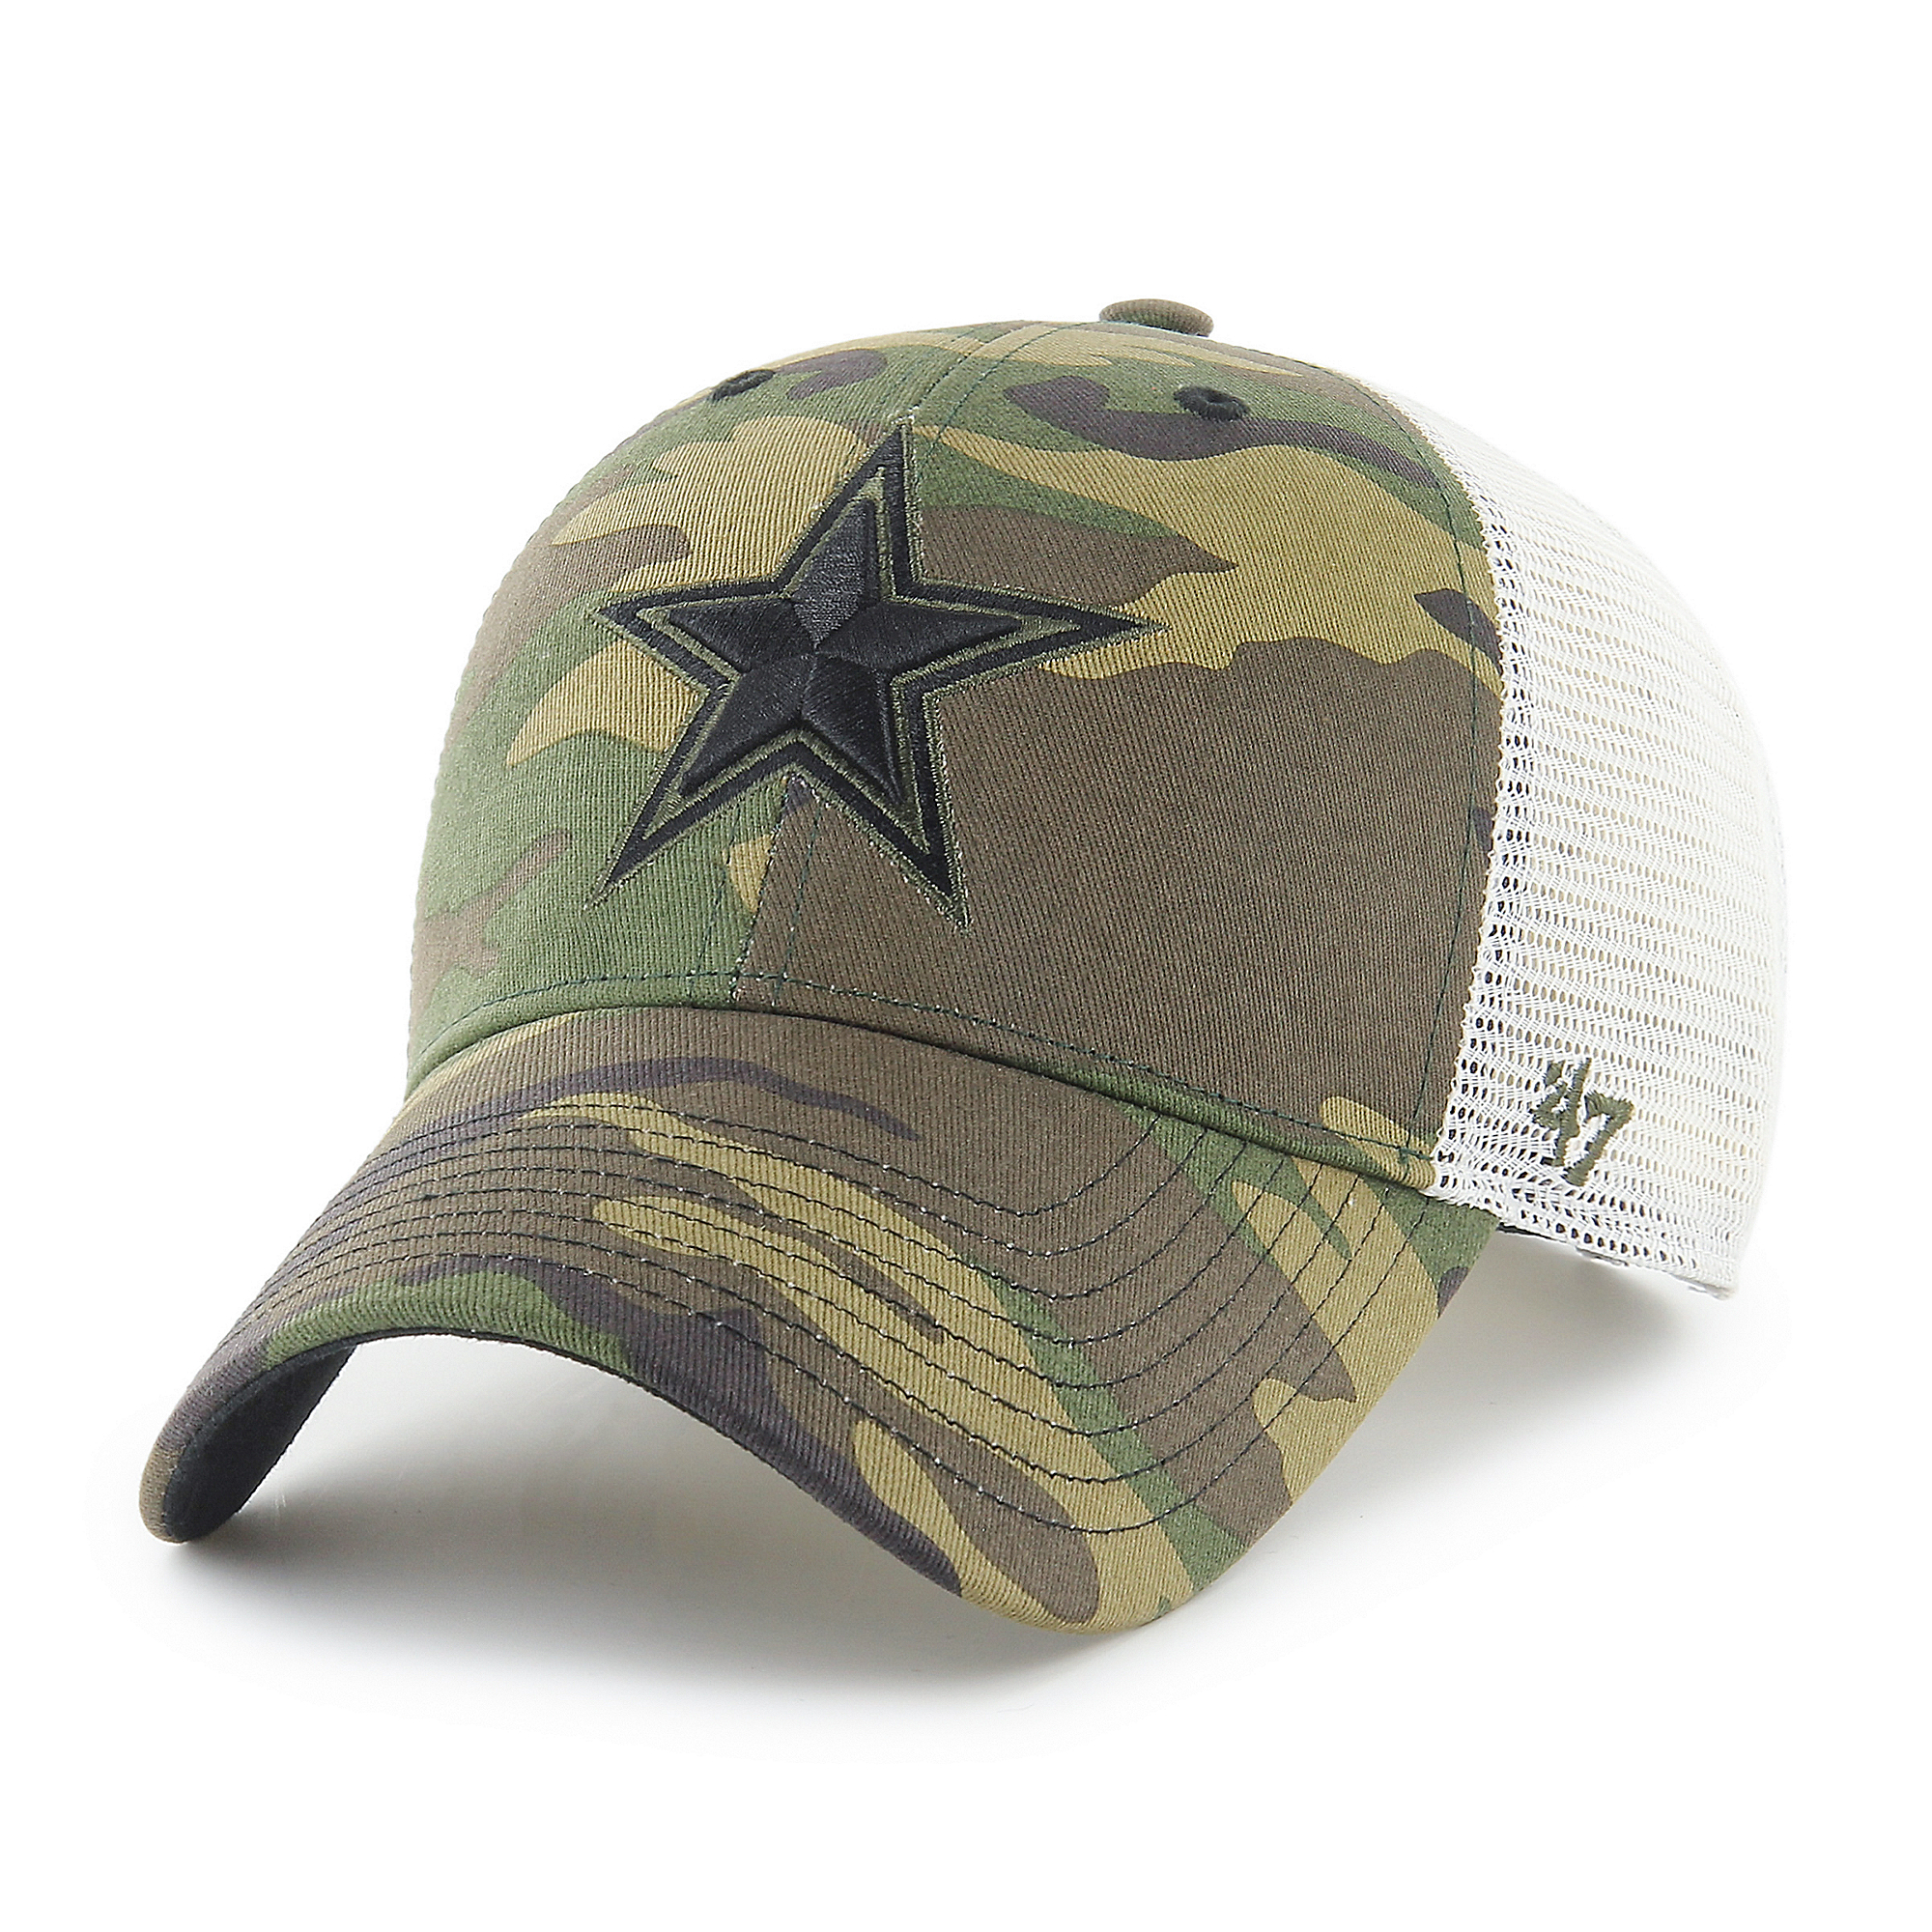 Dallas Cowboys '47 Brand Mens Camo Branson Strap MVP Adjustable Hat